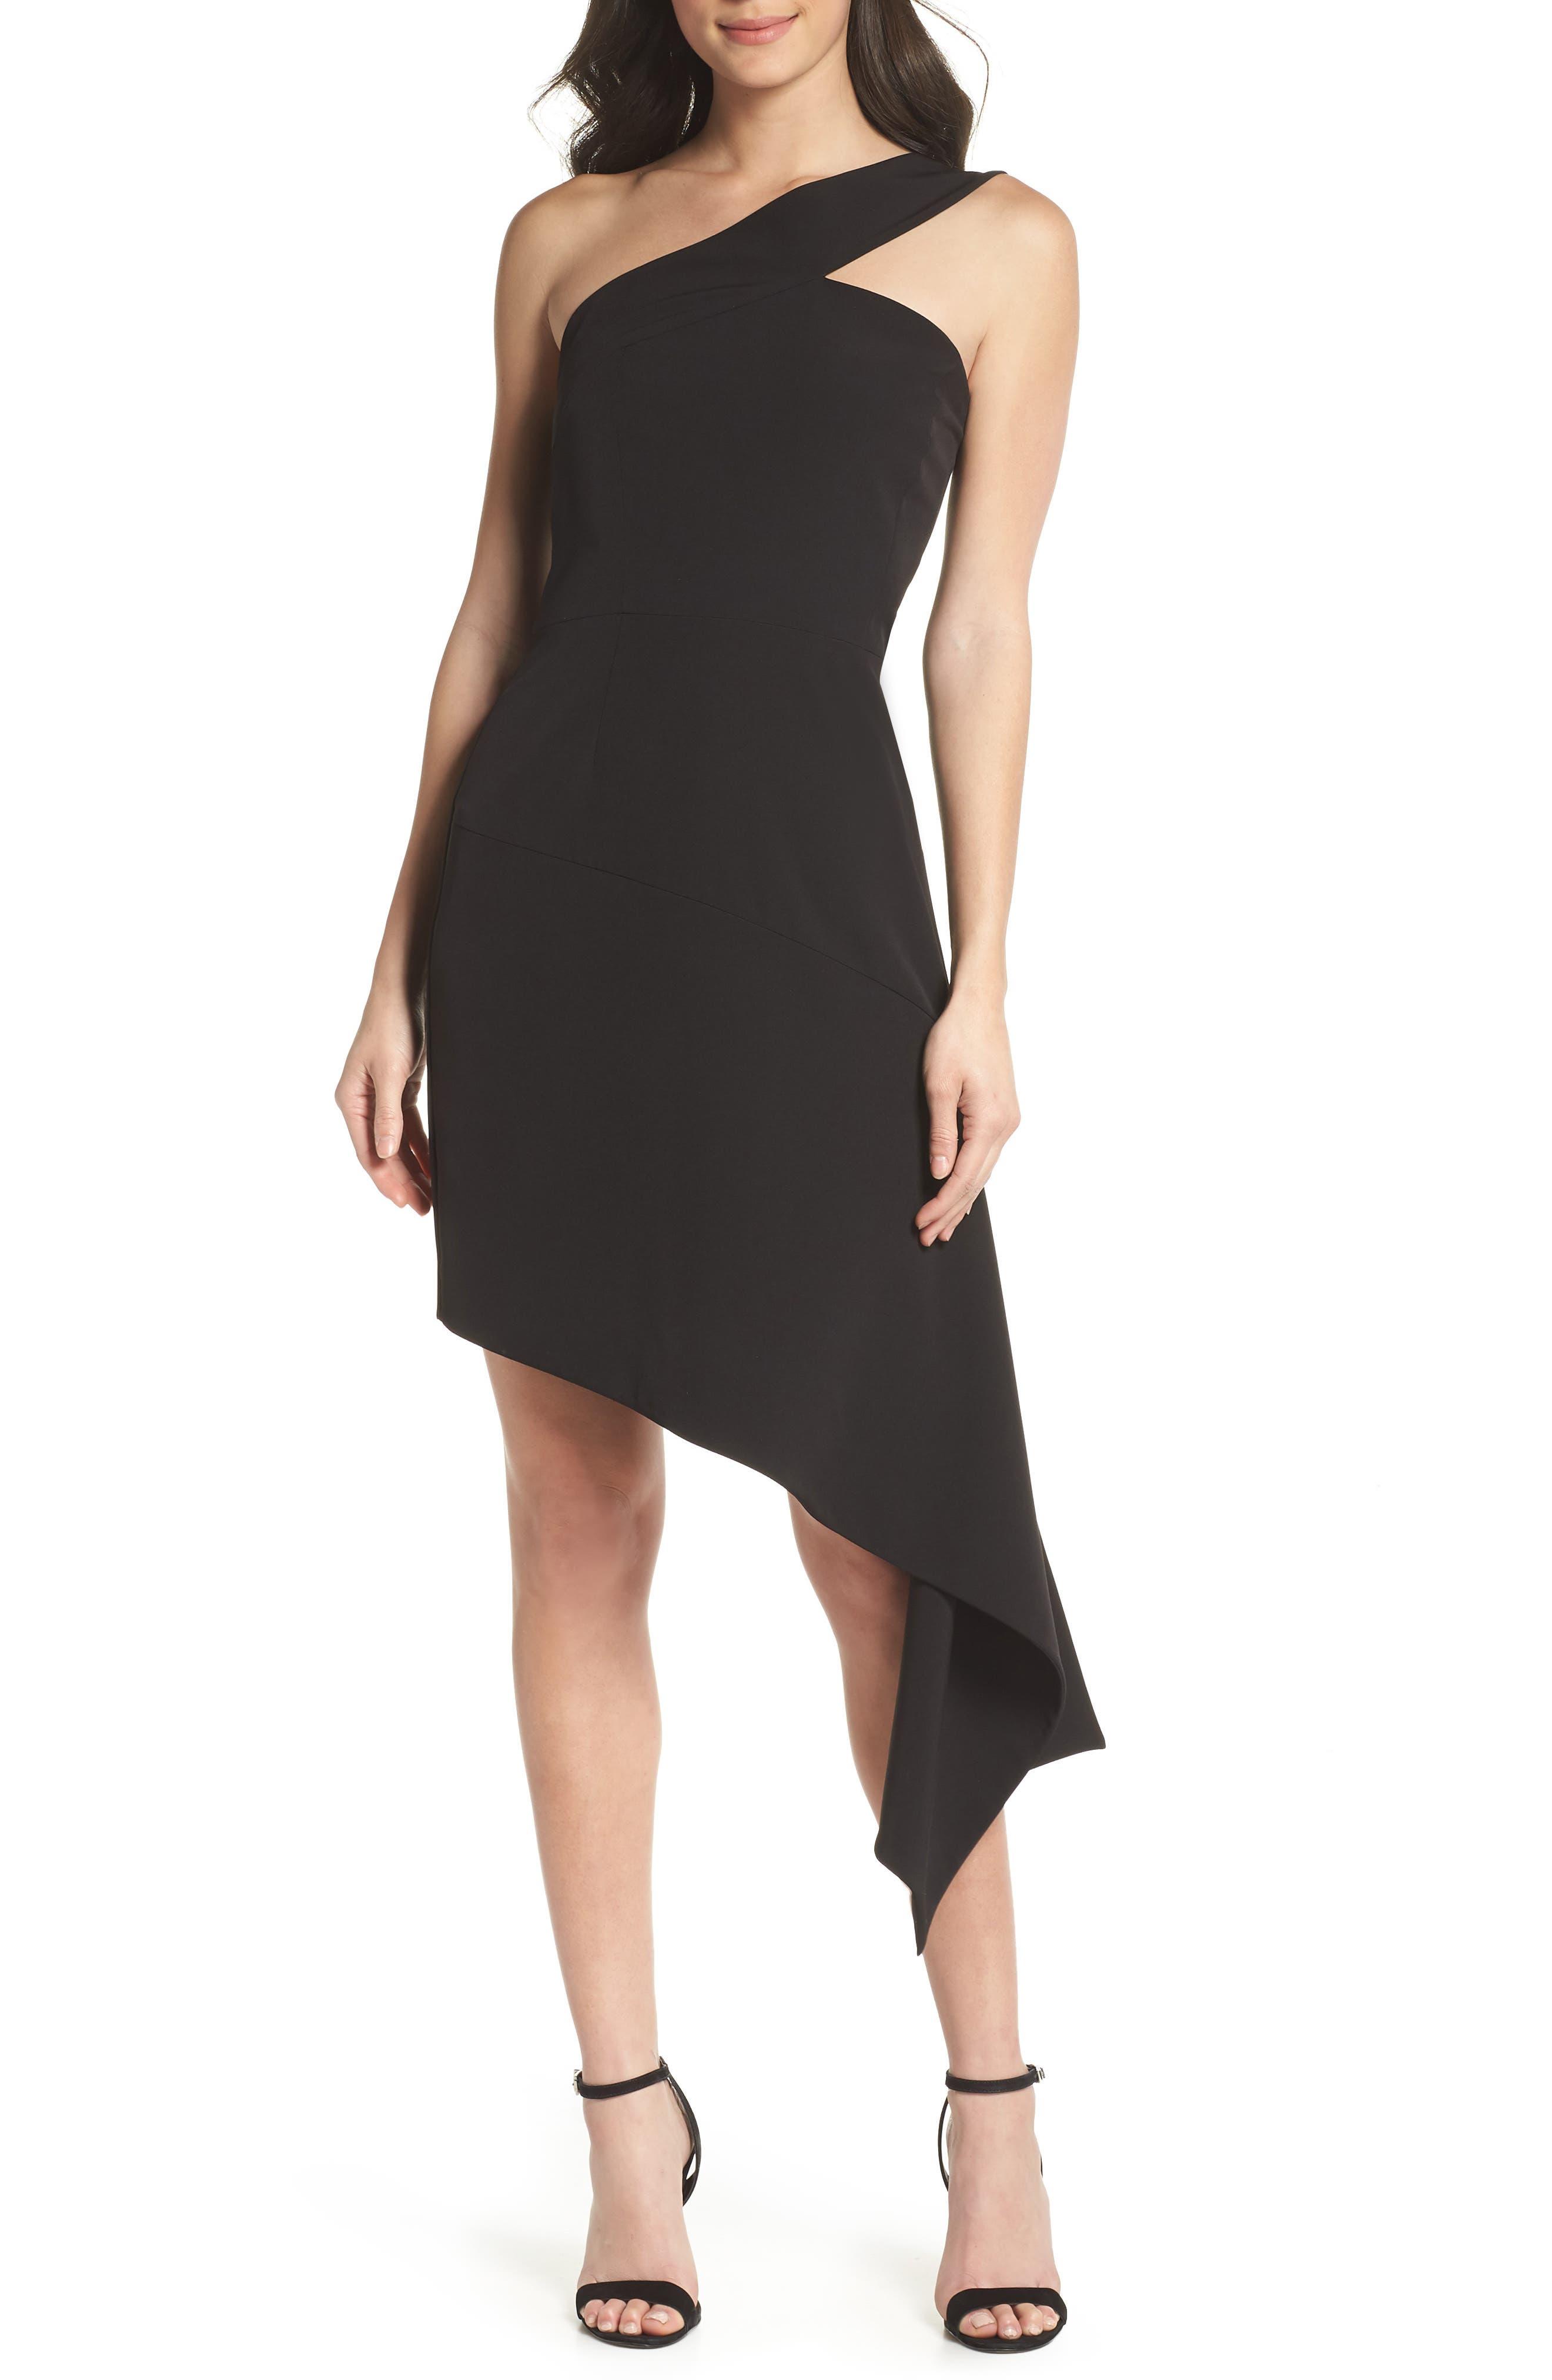 CLOVER AND SLOANE,                             One-Shoulder Asymmetric Dress,                             Main thumbnail 1, color,                             001